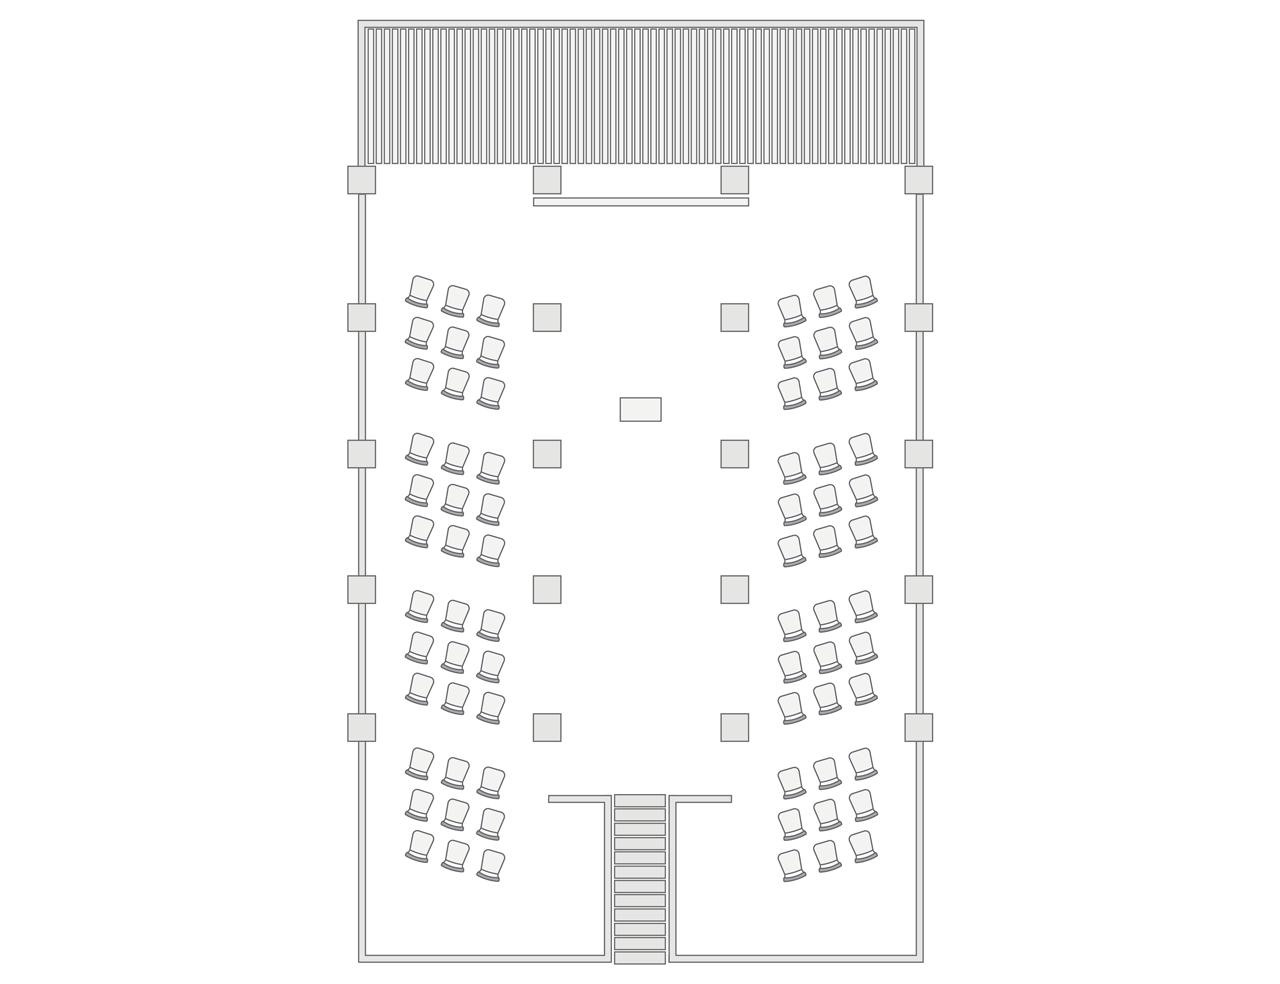 Mayasari theatre setup